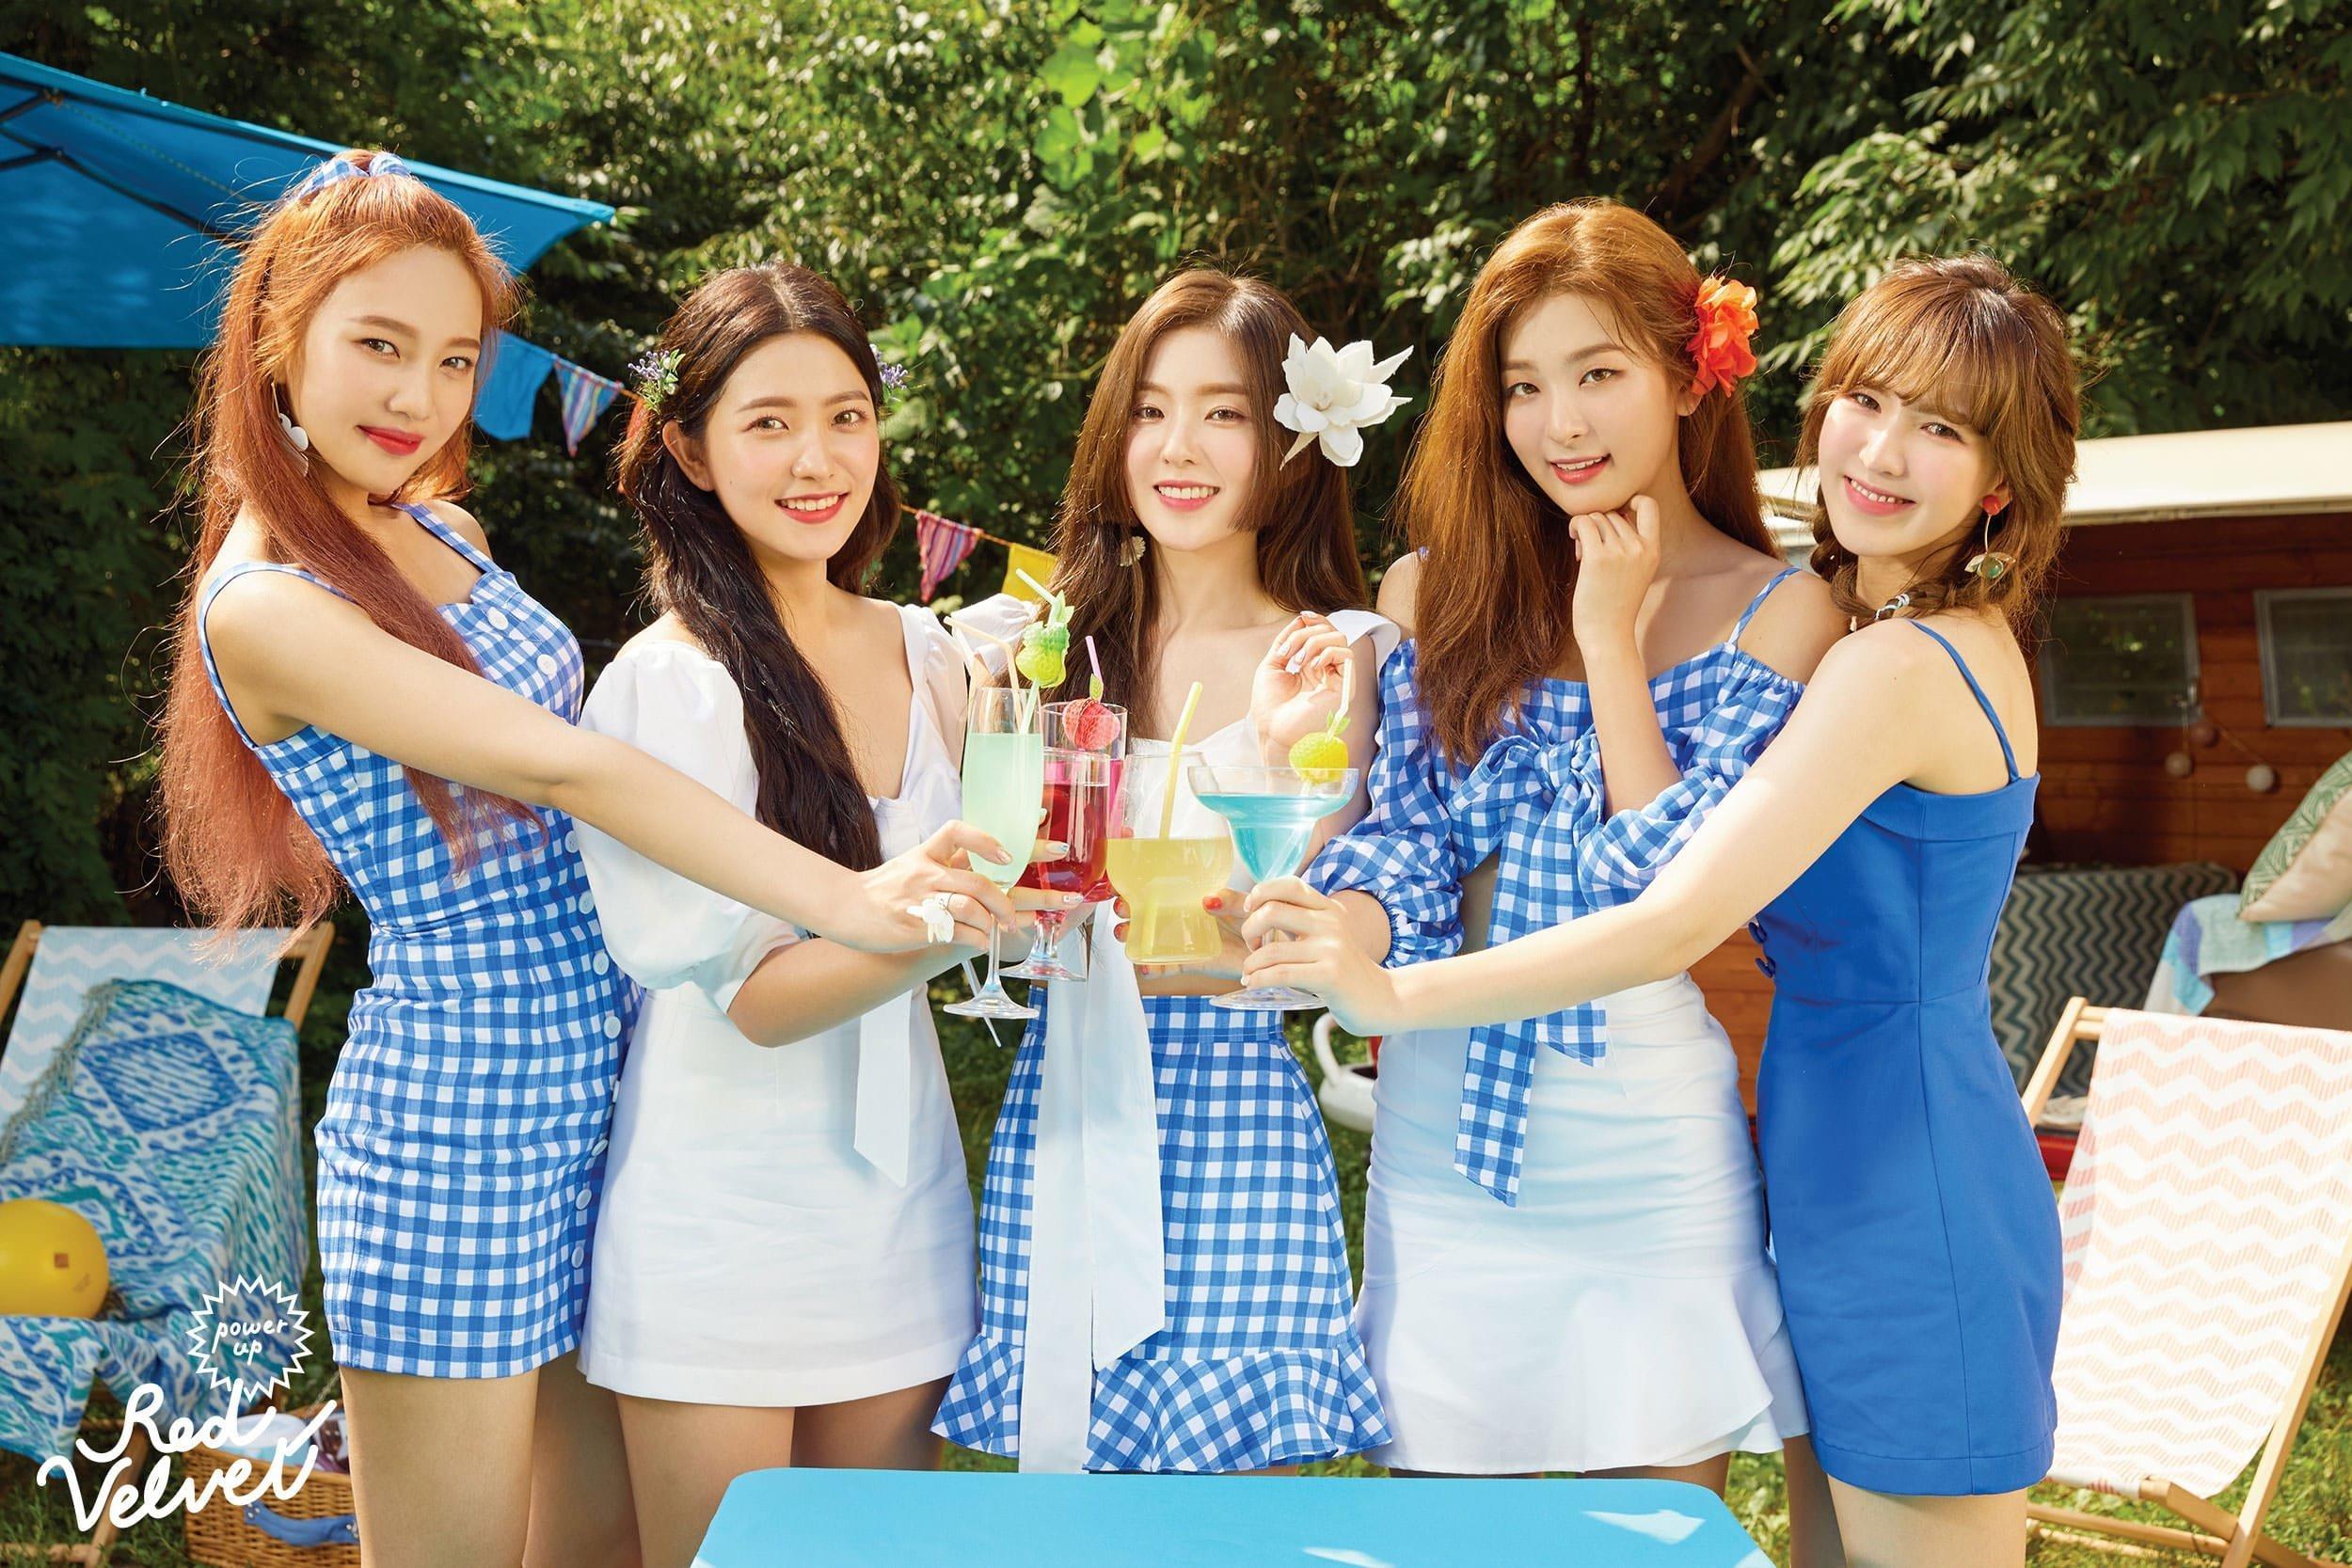 Official] Red Velvet Thread | Stream Umpah Umpah